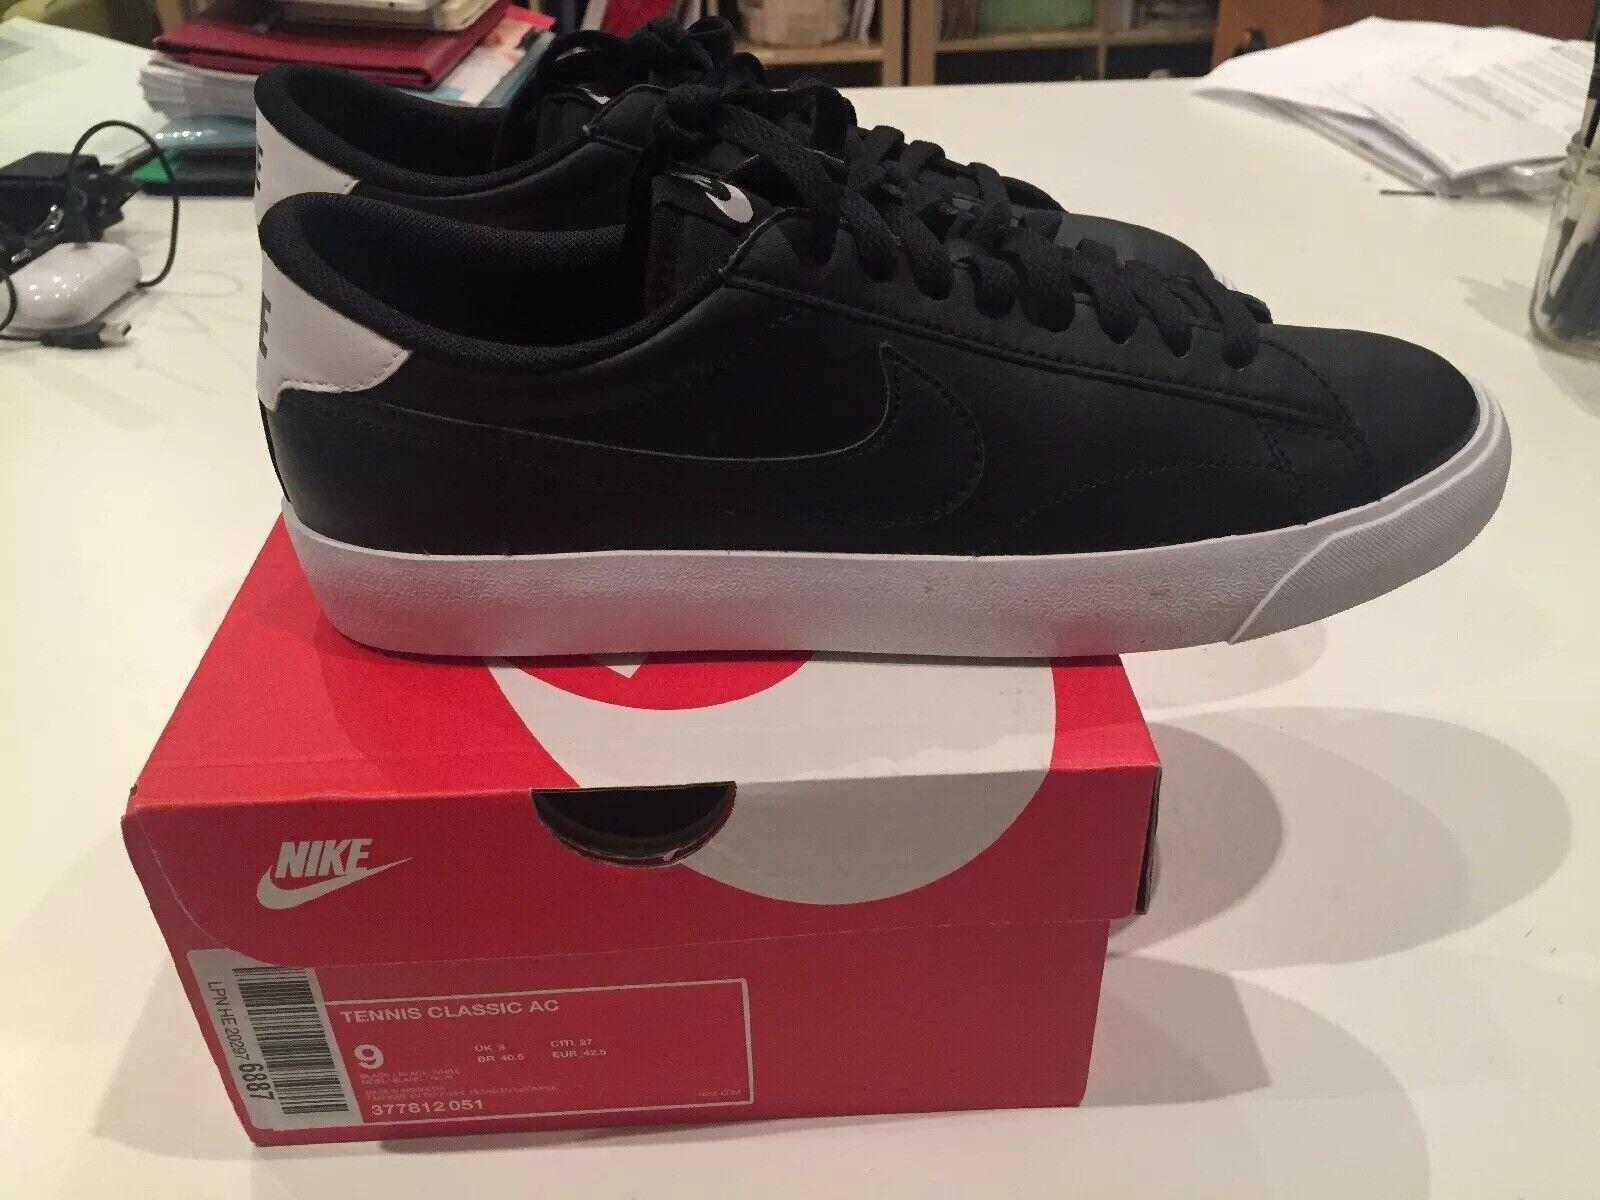 Nike Tennis Clásico AC Negro Calzado para Tenis